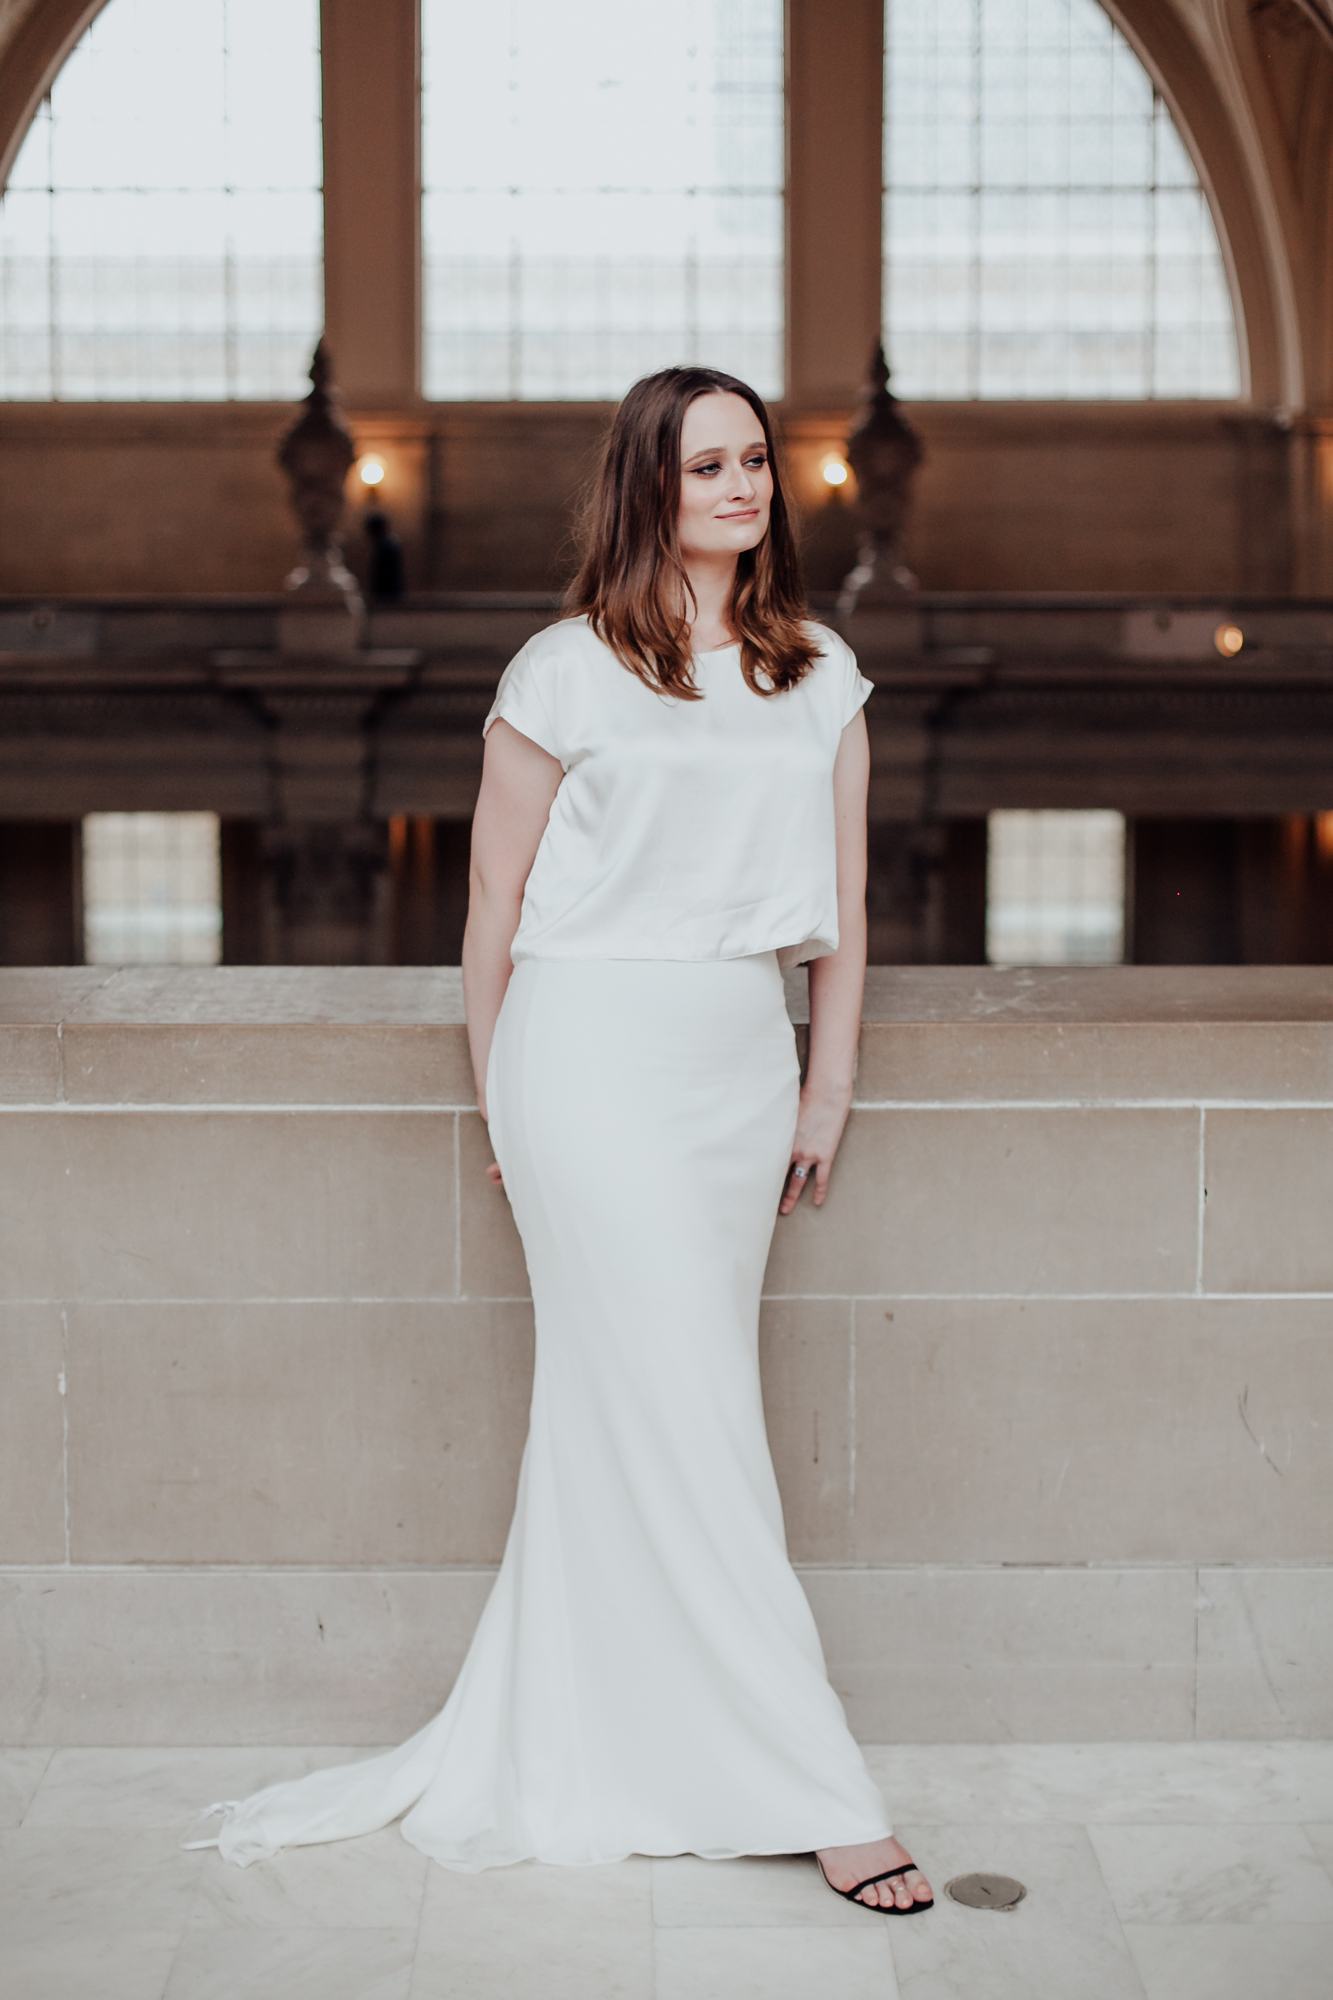 san-francisco-city-hall-wedding-marble-rye-photography-011730.JPG